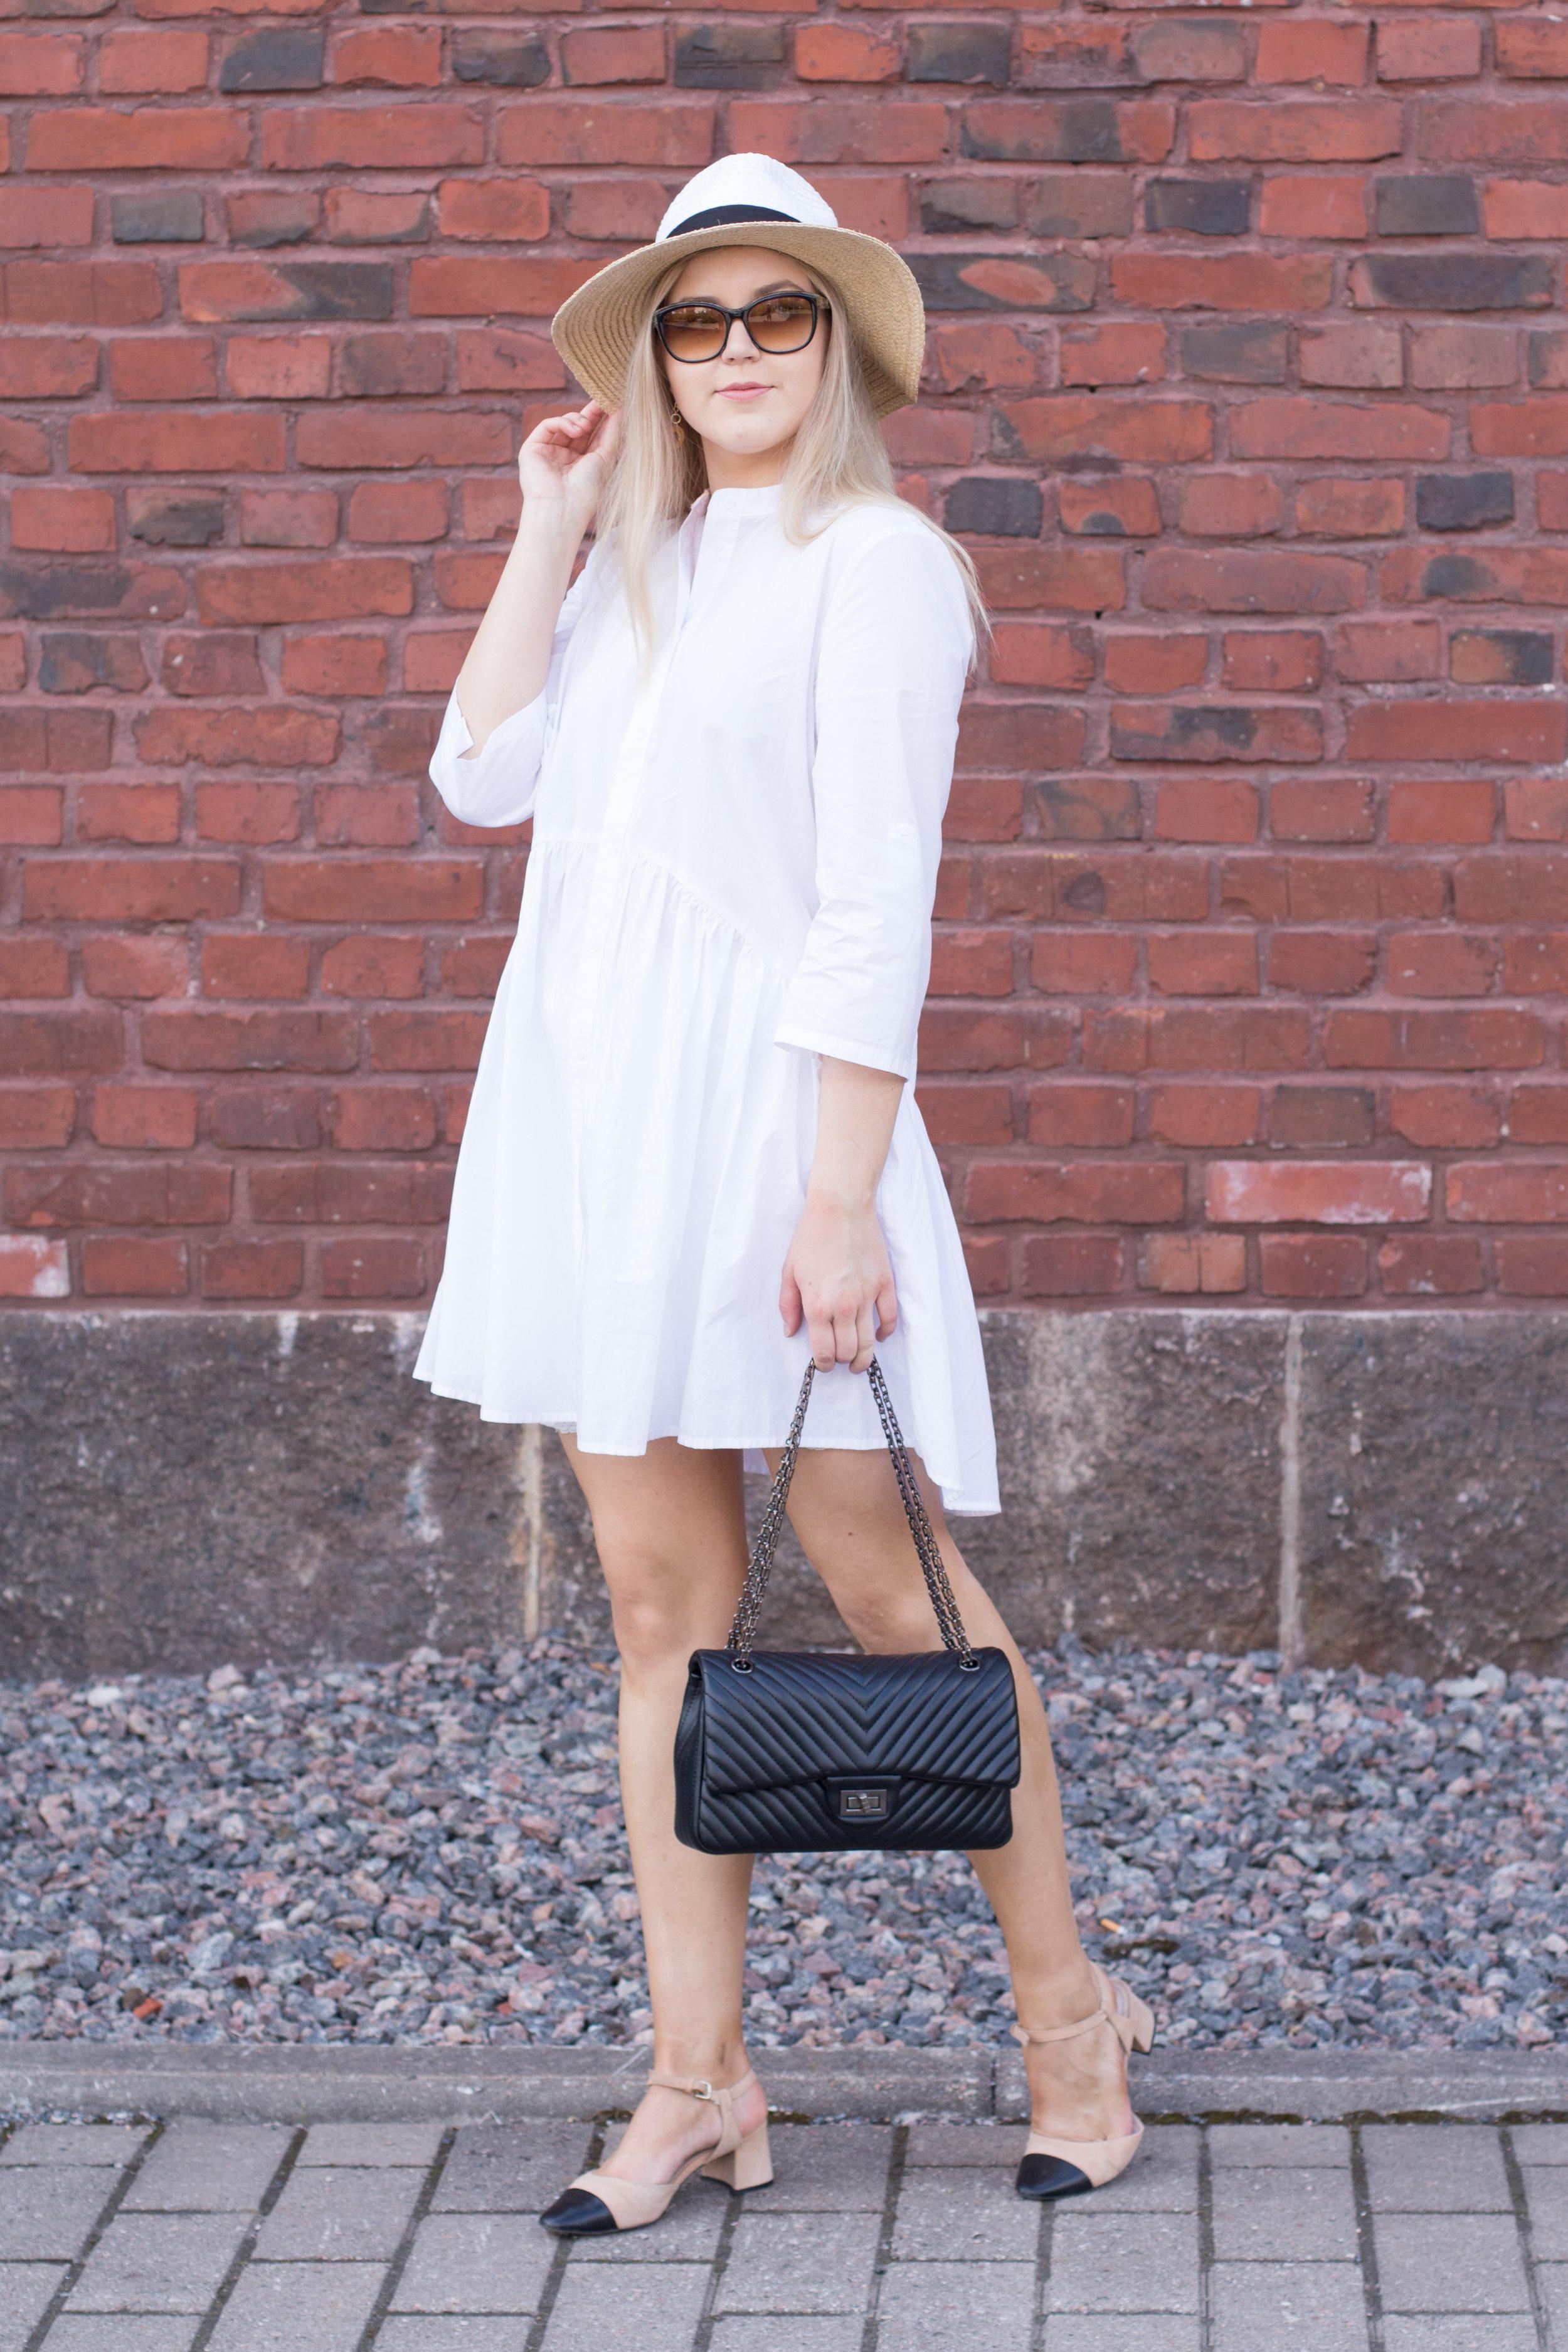 White summer dress with sunglasses.jpg